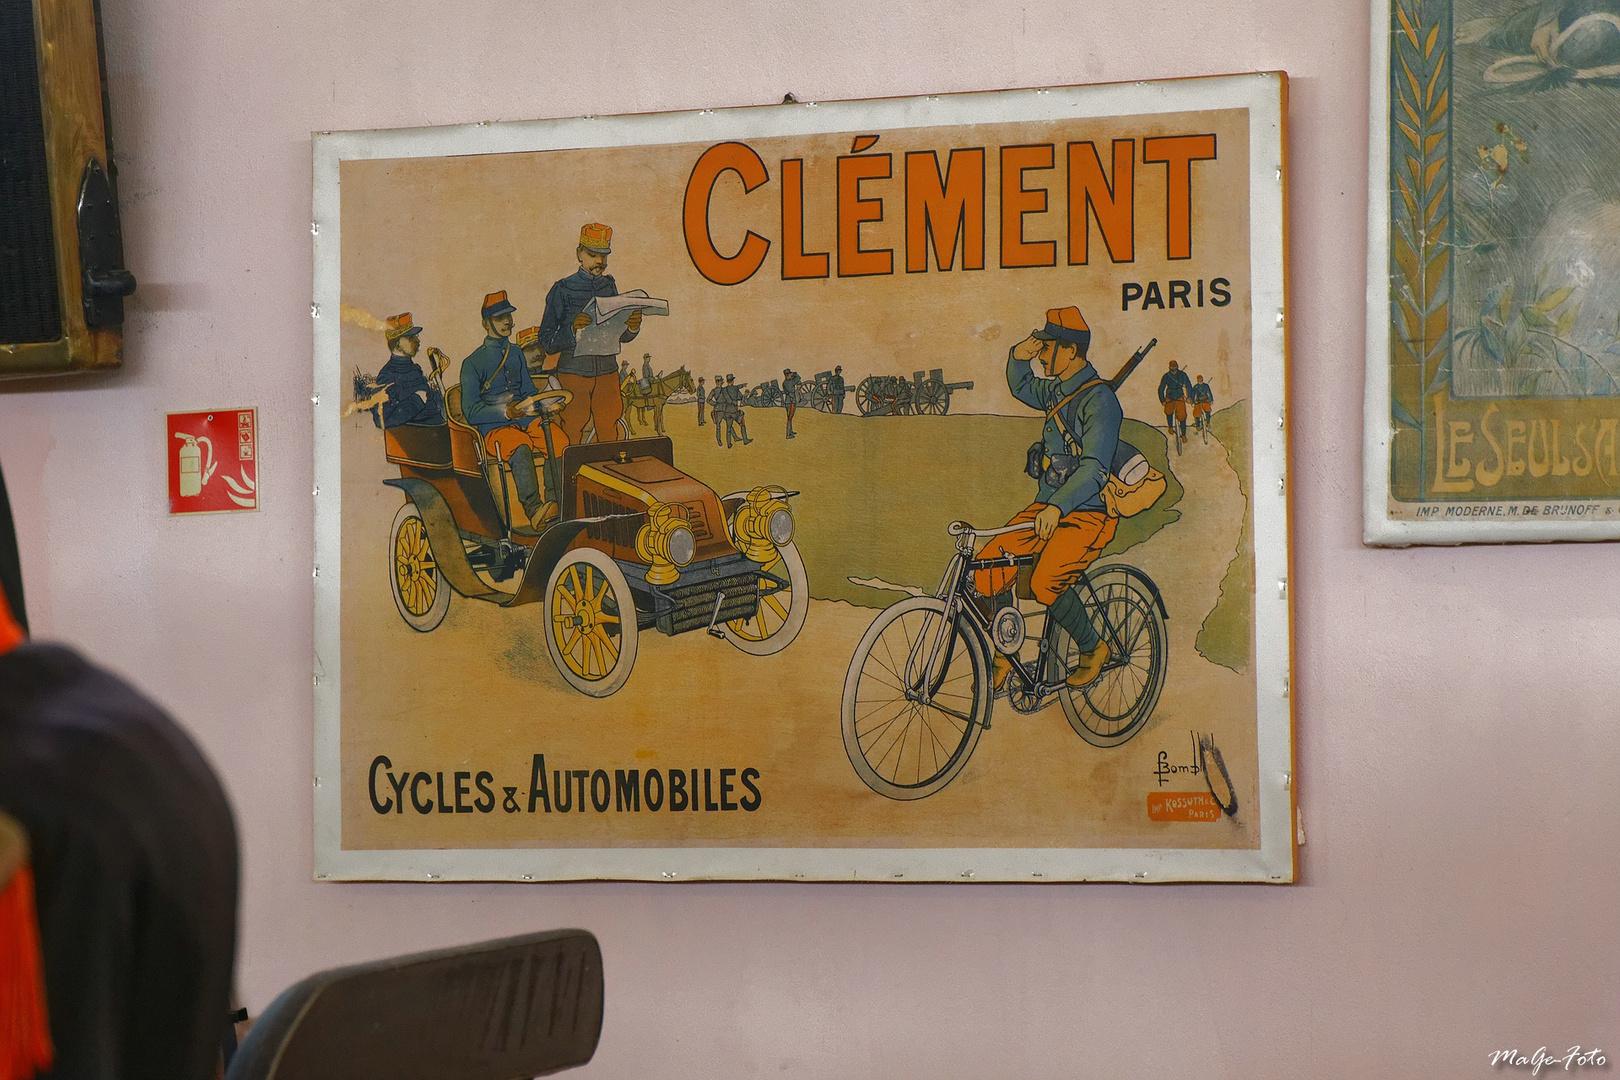 Werbung - La publicité - Wie dazumal